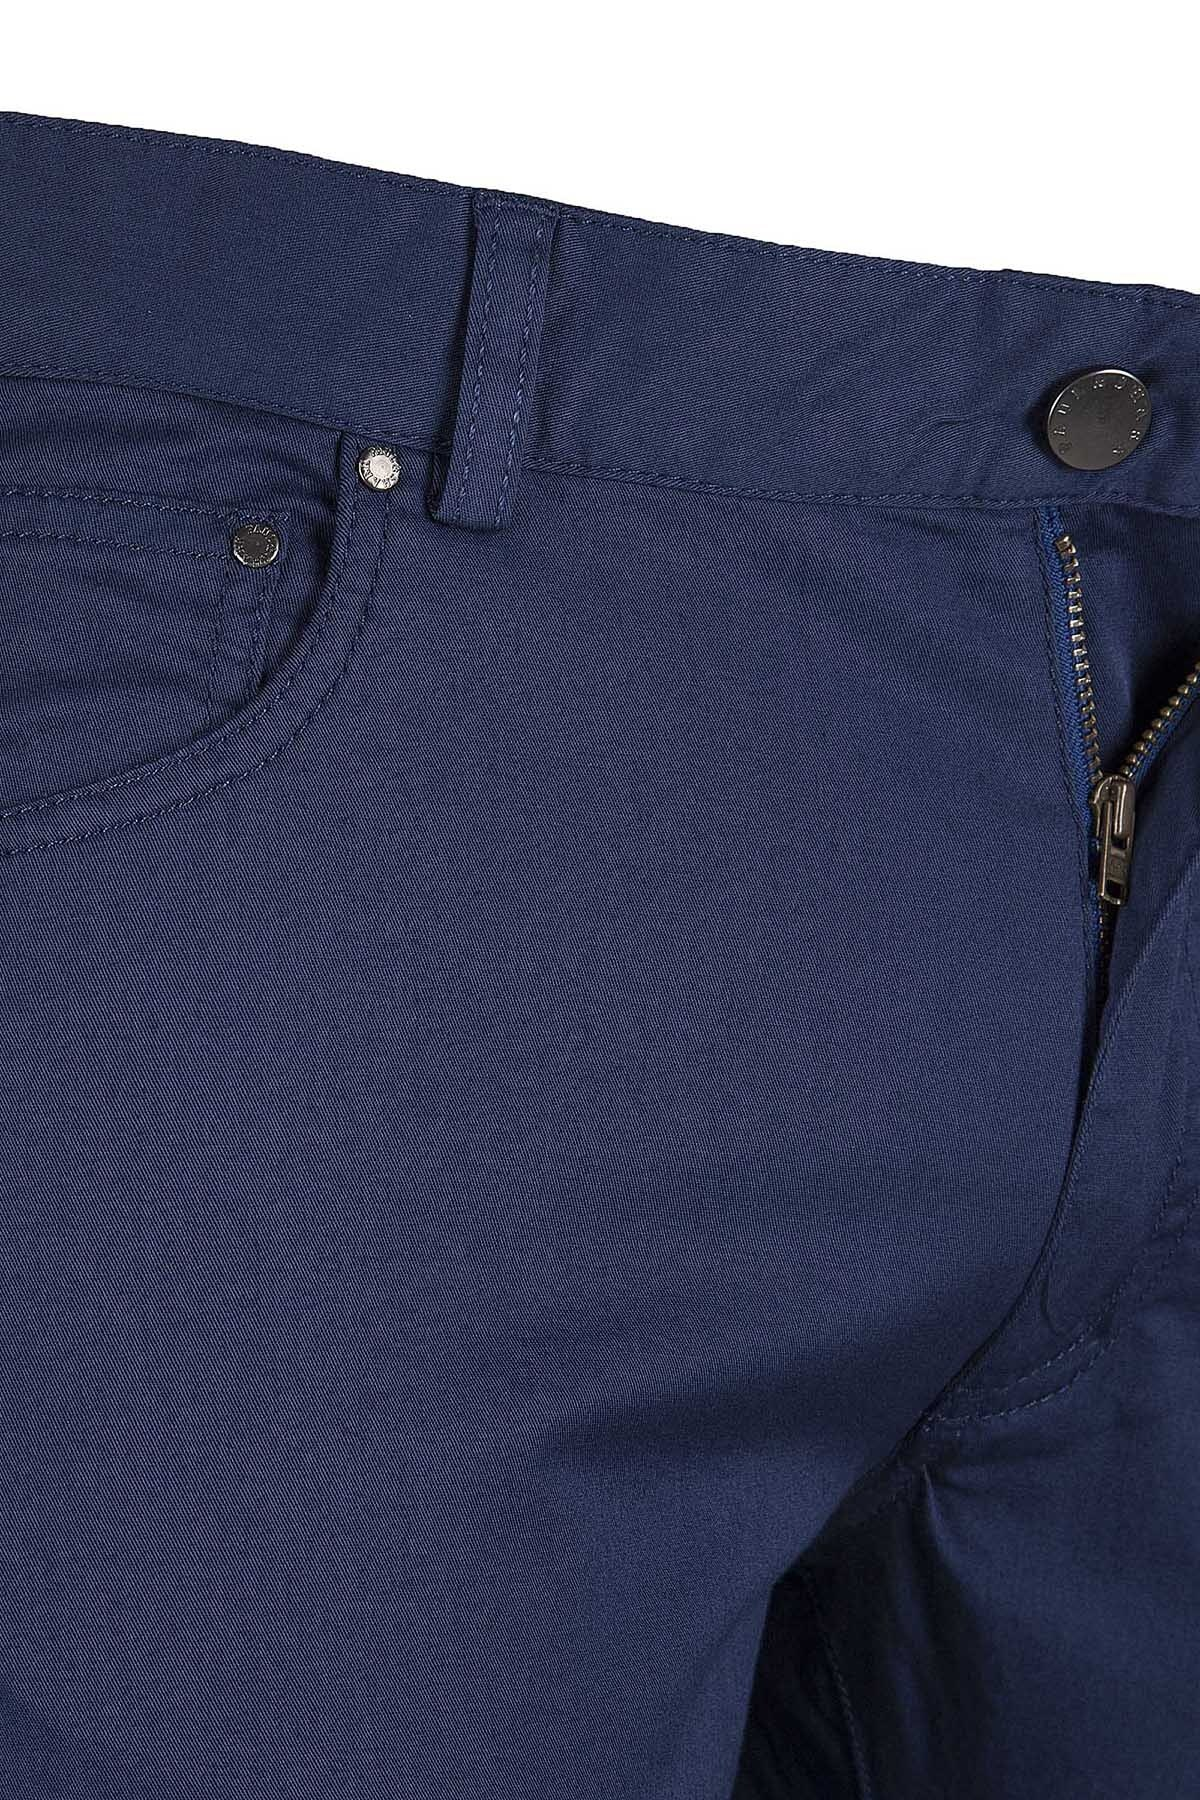 PAUL&SHARK JEANS Erkek Pamuklu Pantolon P18P4002SF 243 LACİVERT